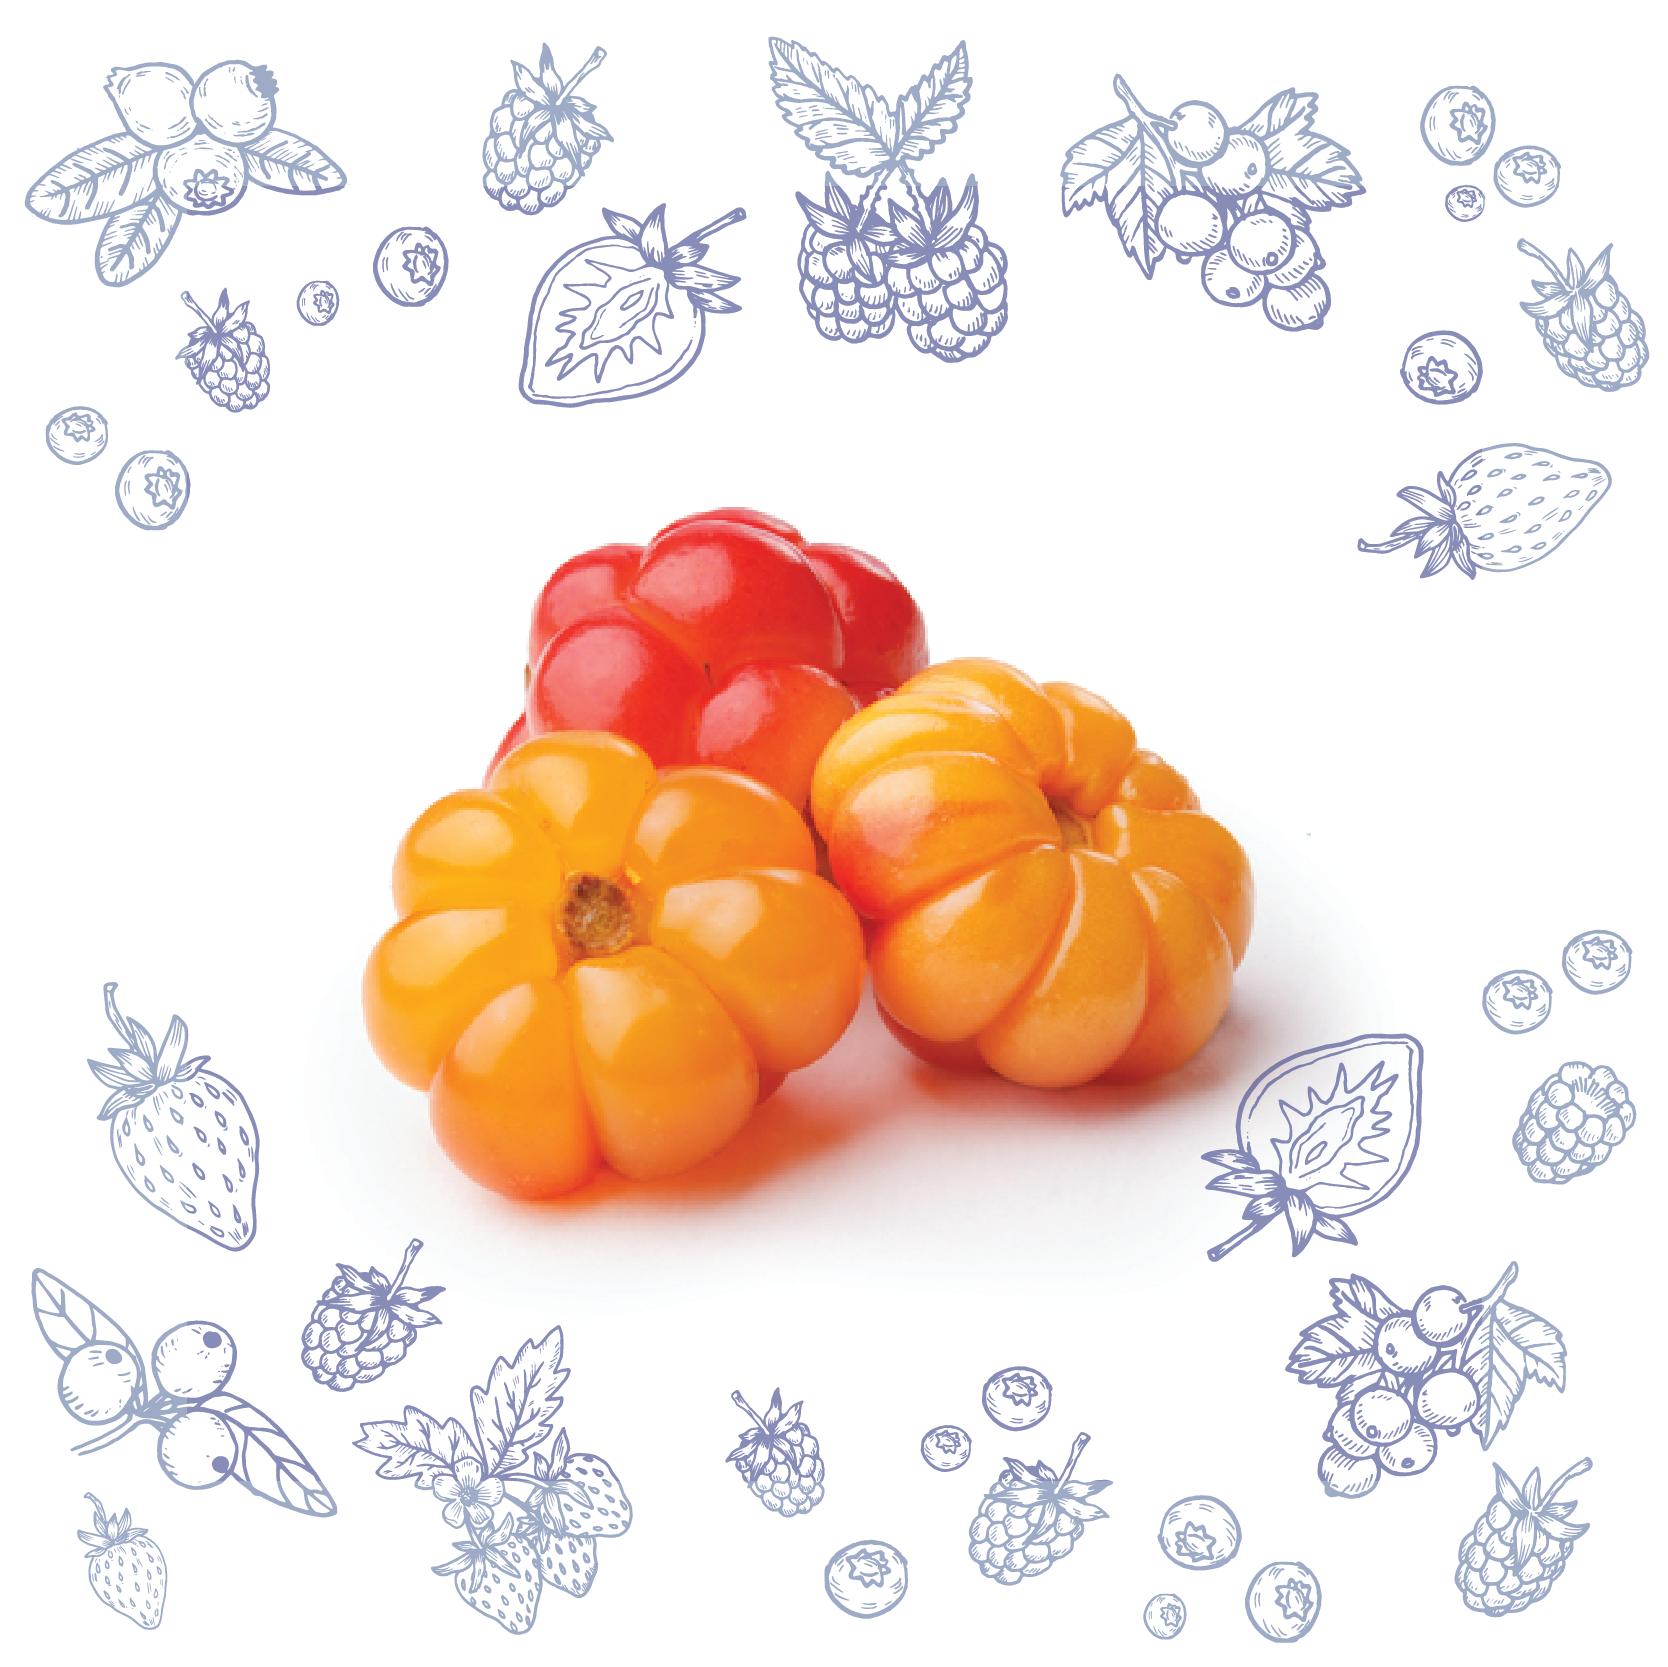 Polarica-Berries-lakka